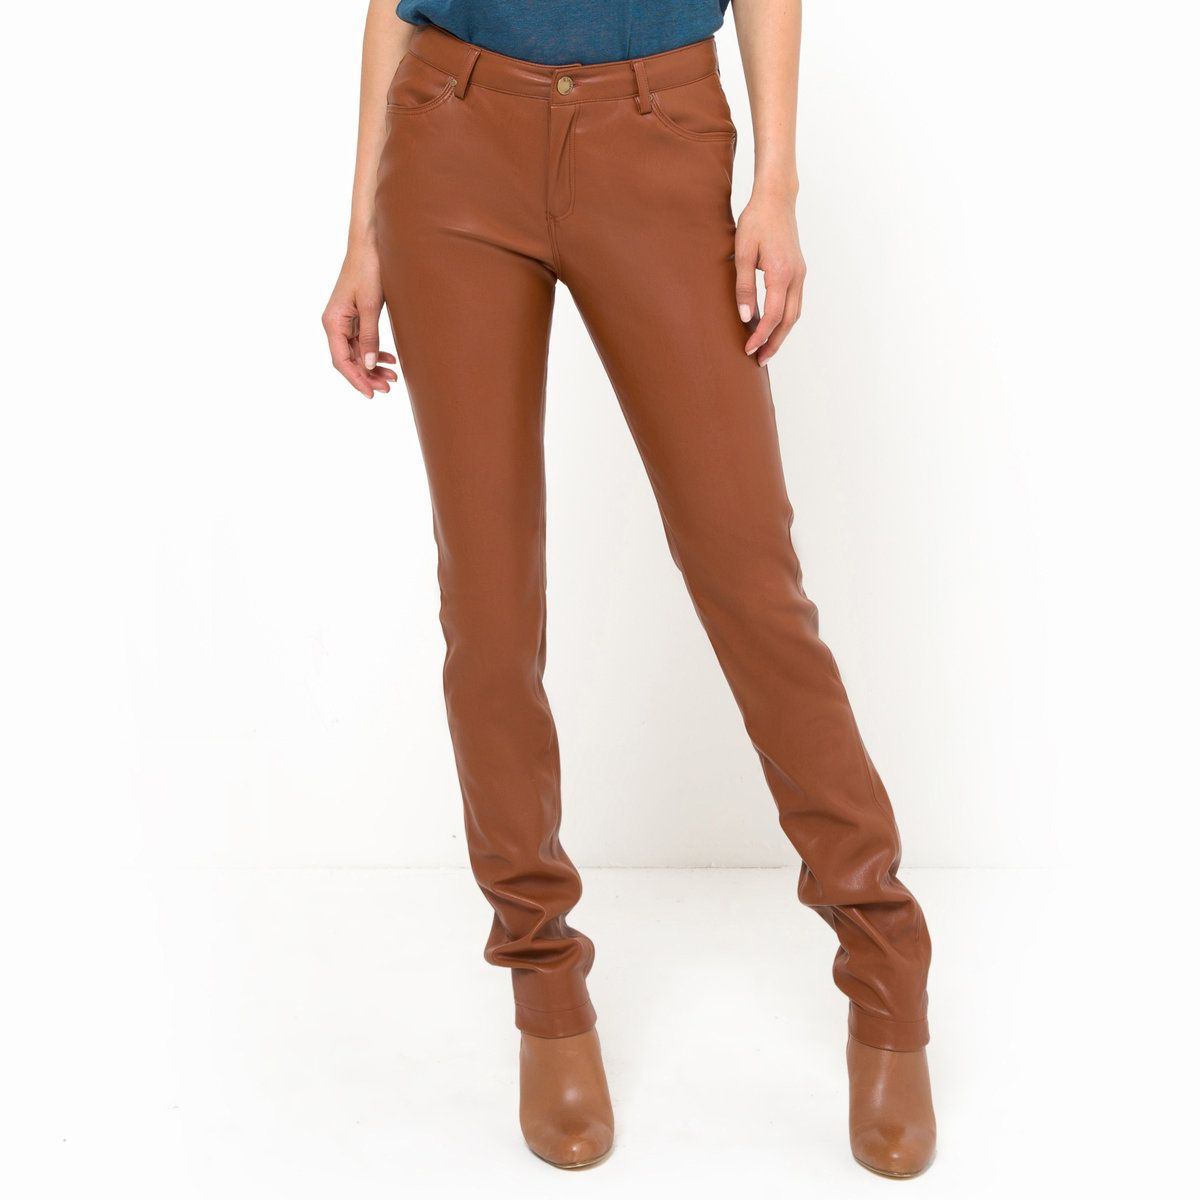 Femme Vêtements Pantalon Pantalon slim